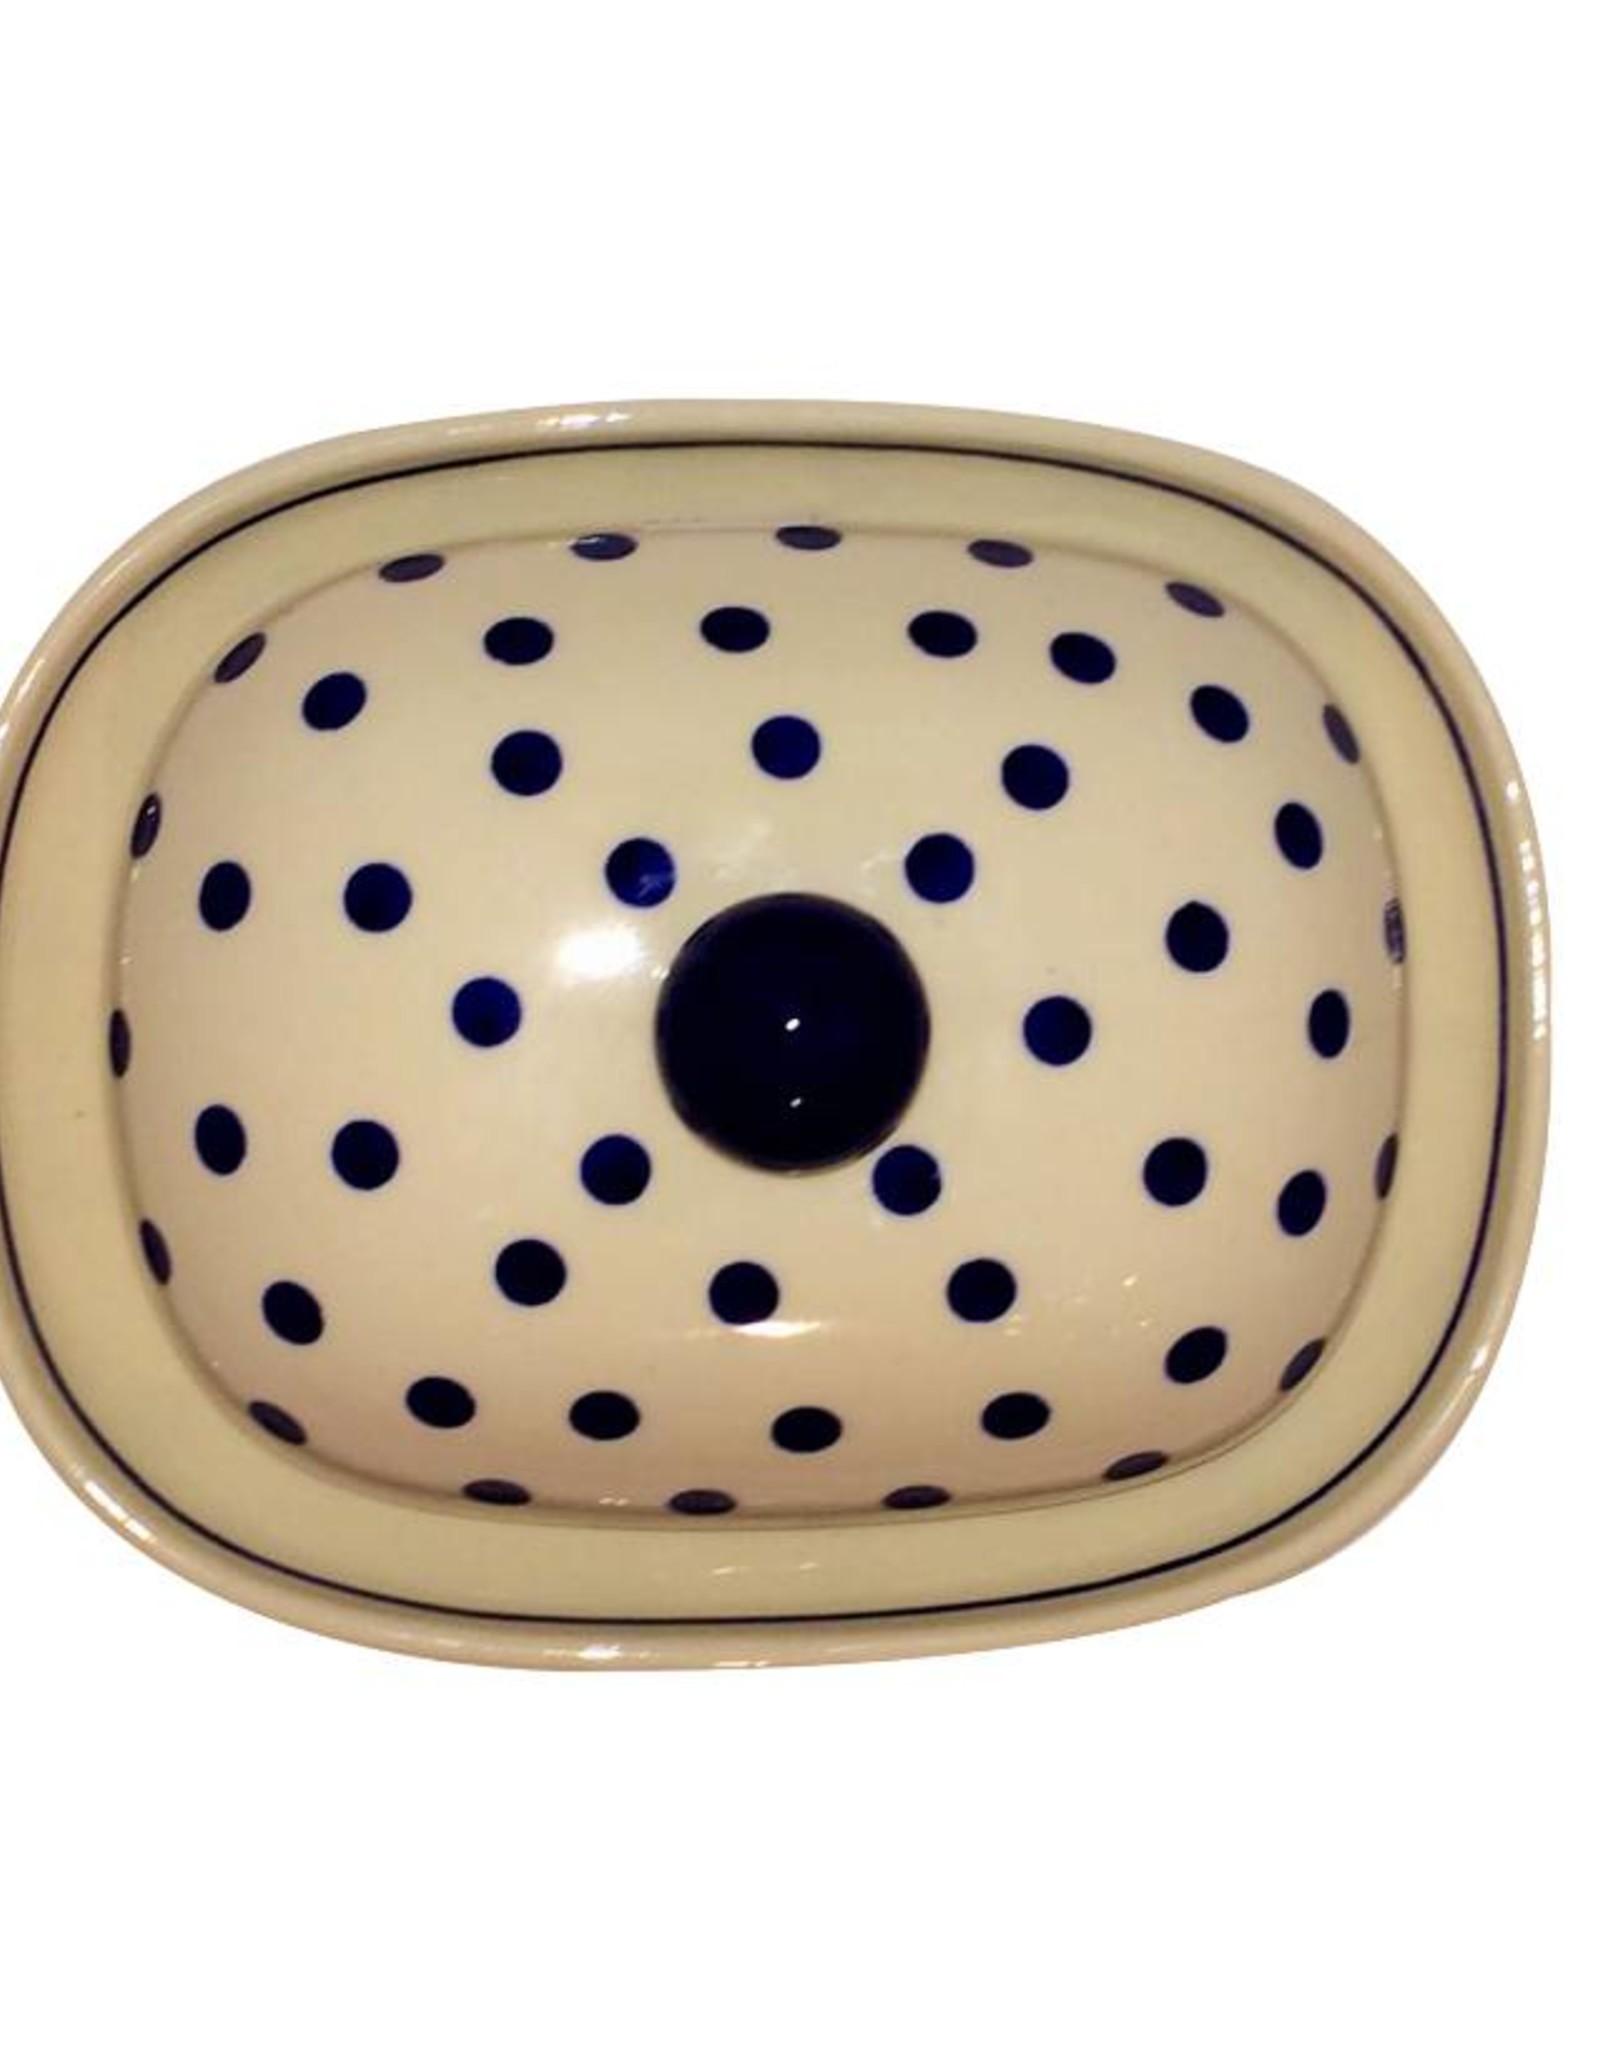 Butter Dish - Blue/White Dots - Double Stick